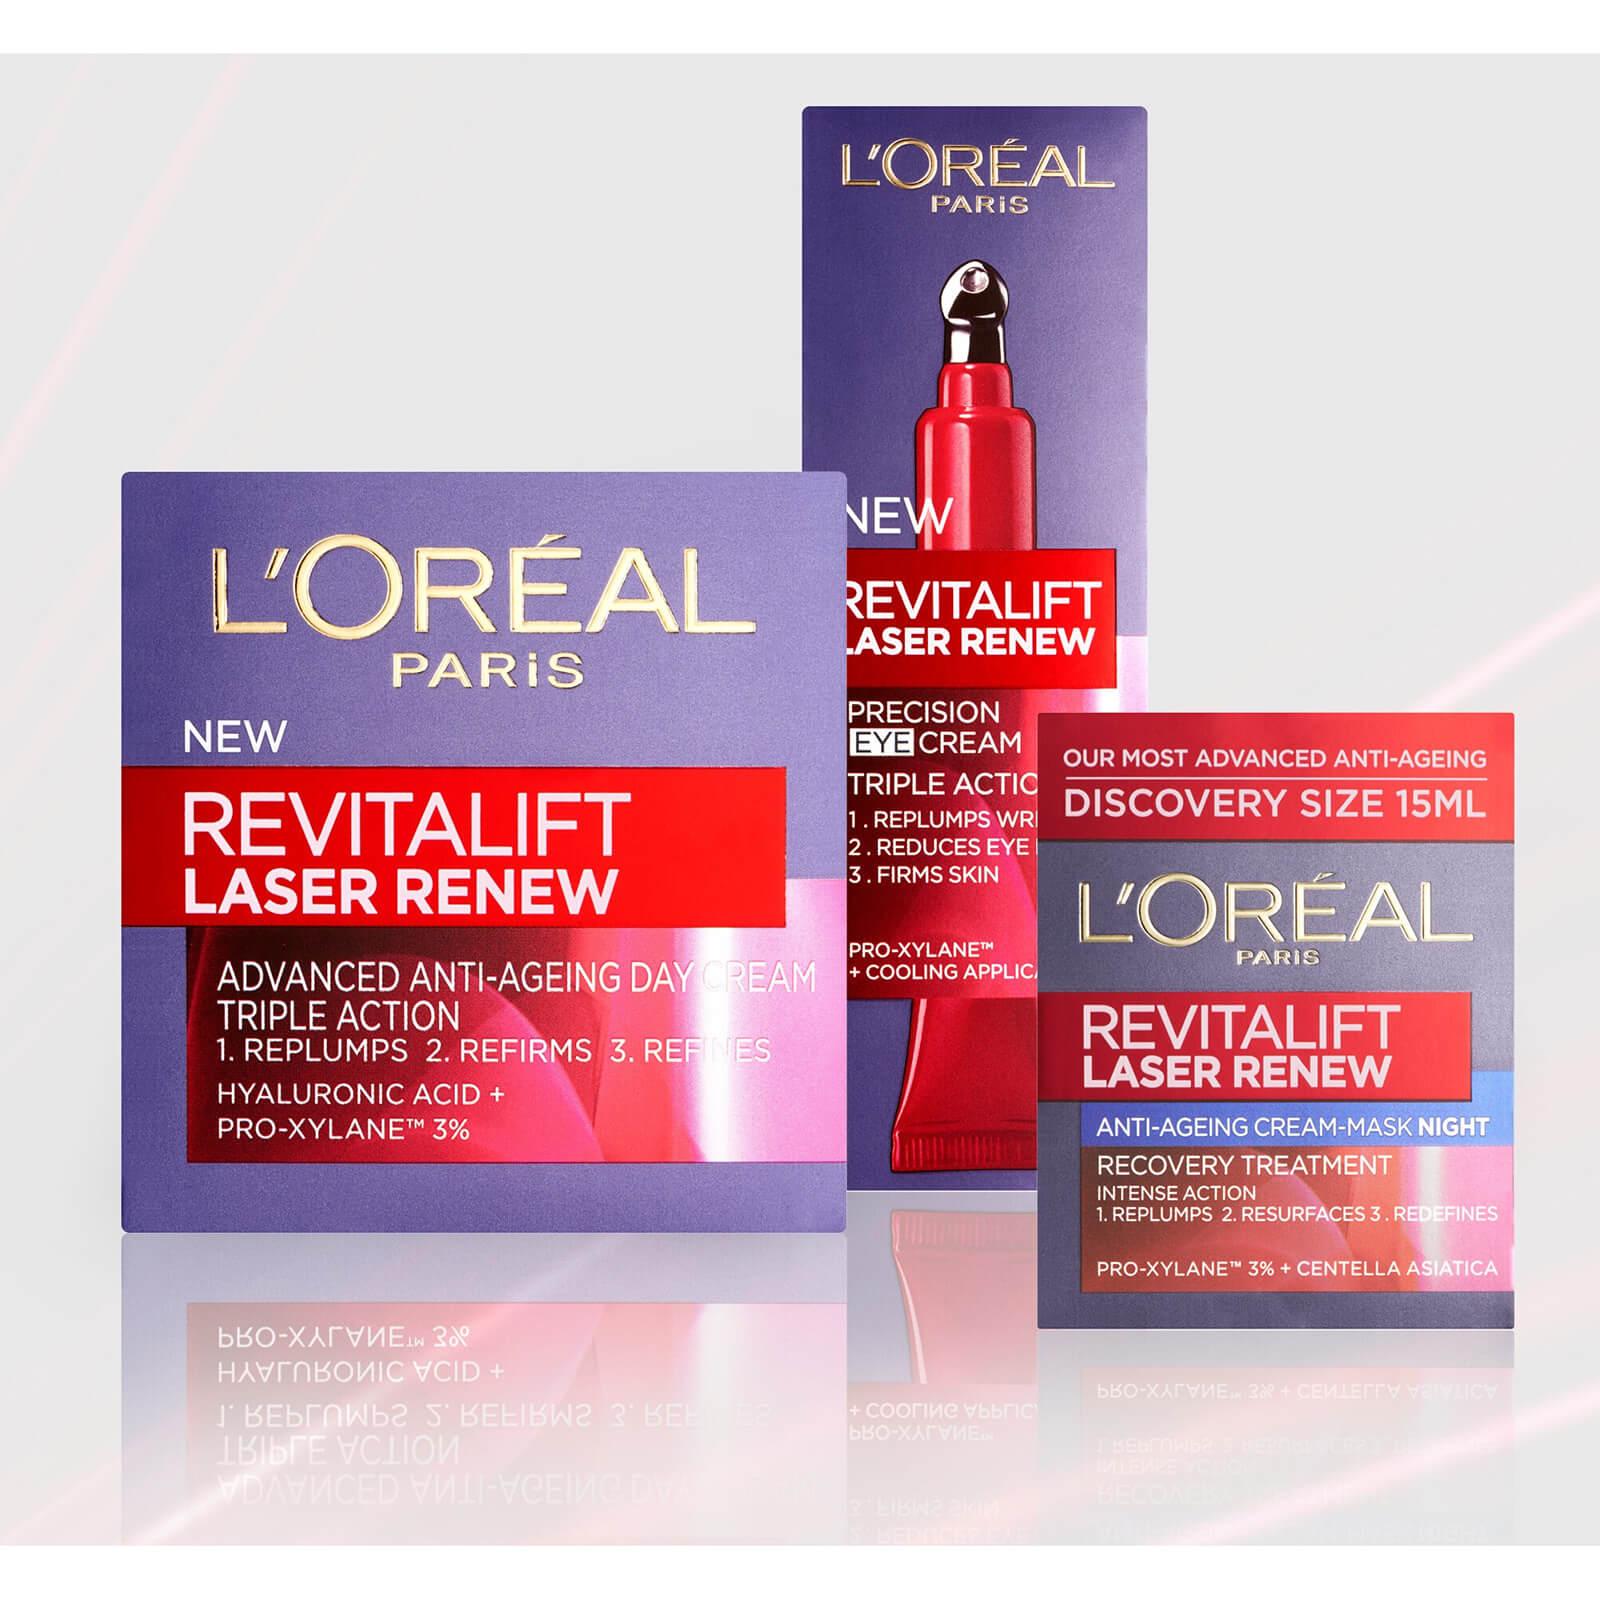 L'Oréal Paris Revitalift Laser Renew Anti-Ageing Skincare Moisturiser Set a Look Fantastic for £20.99 (£2.95 delivery)